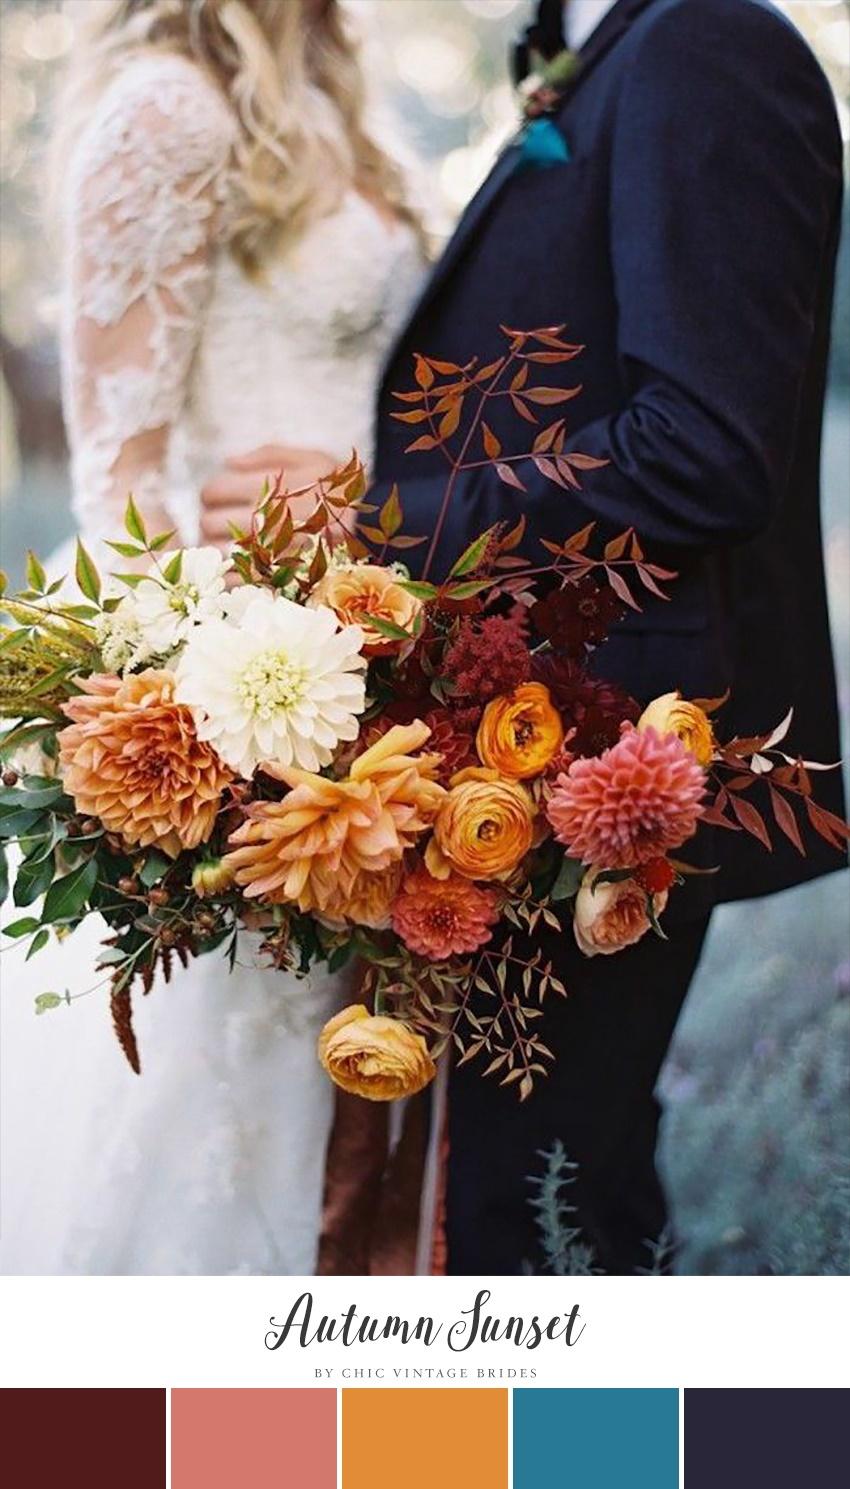 10 Stunning Autumn Wedding Colour Palettes – Chic Vintage Brides